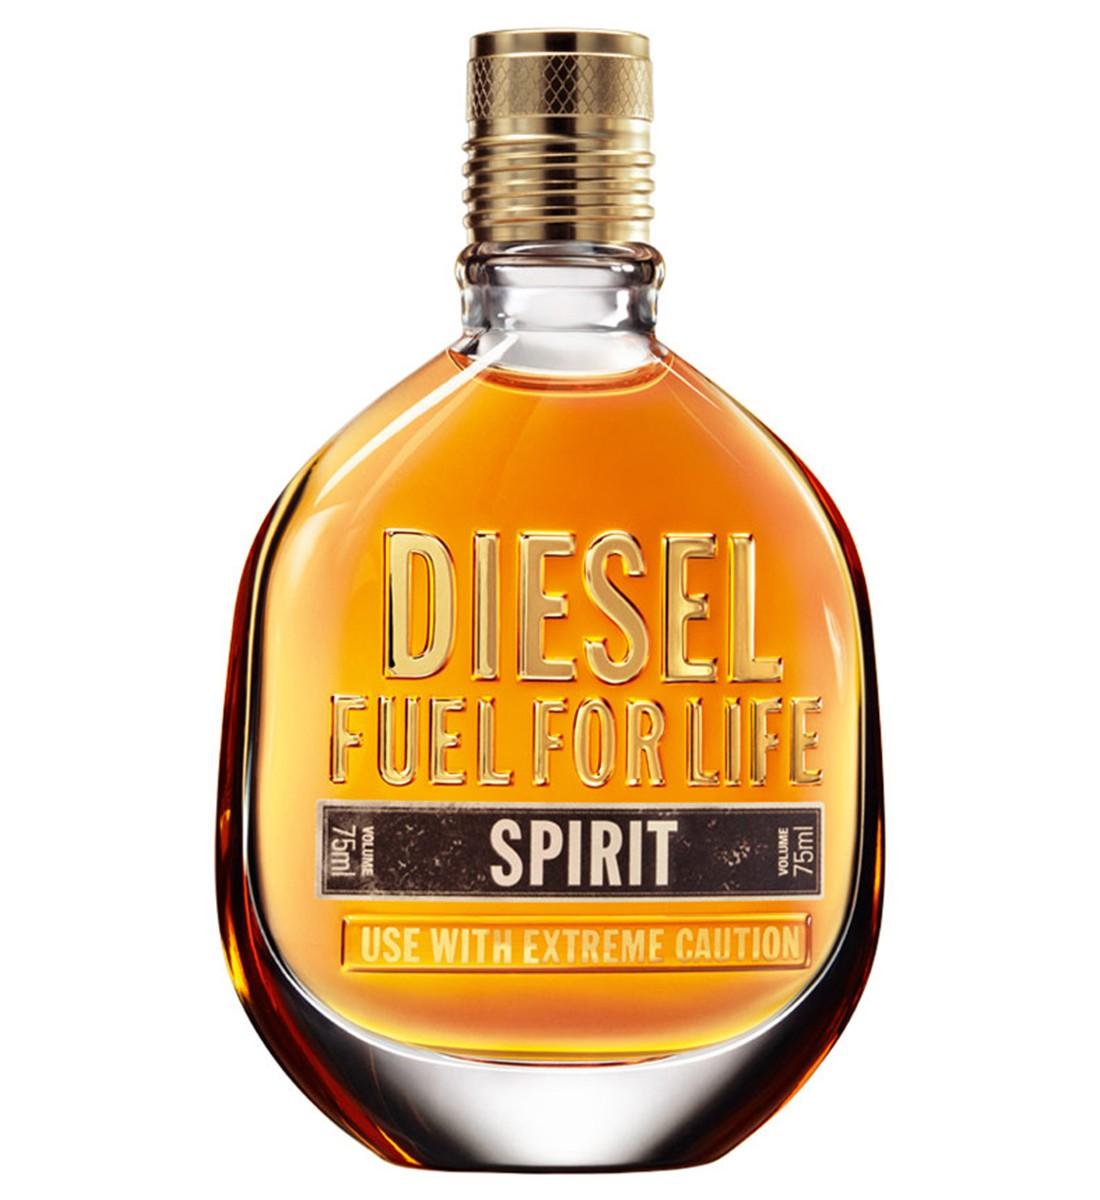 Diesel Fuel for Life Spirit аромат для мужчин